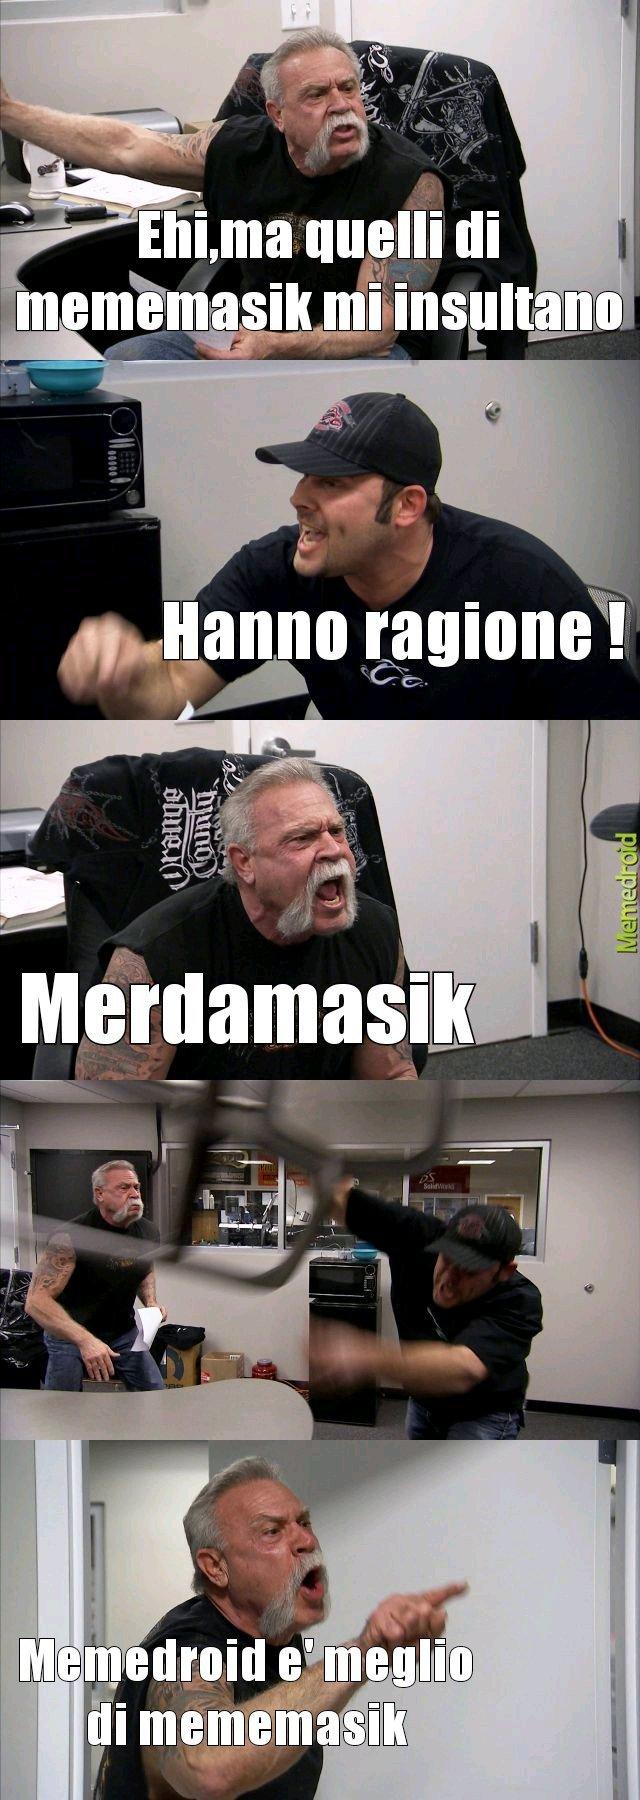 MERDAMASIK - meme